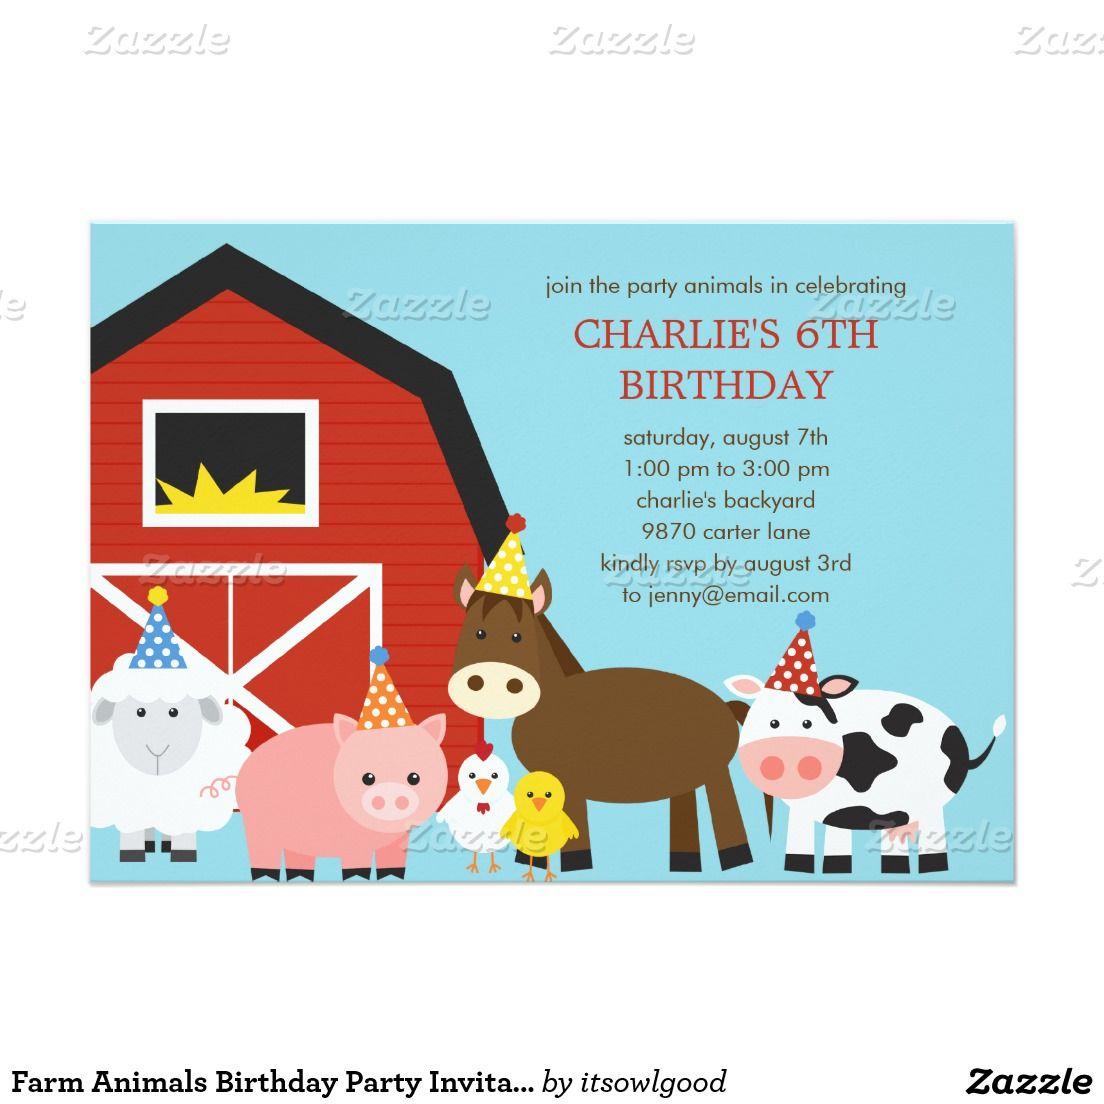 Farm Animals Birthday Party Invitation | Animal birthday, Party ...